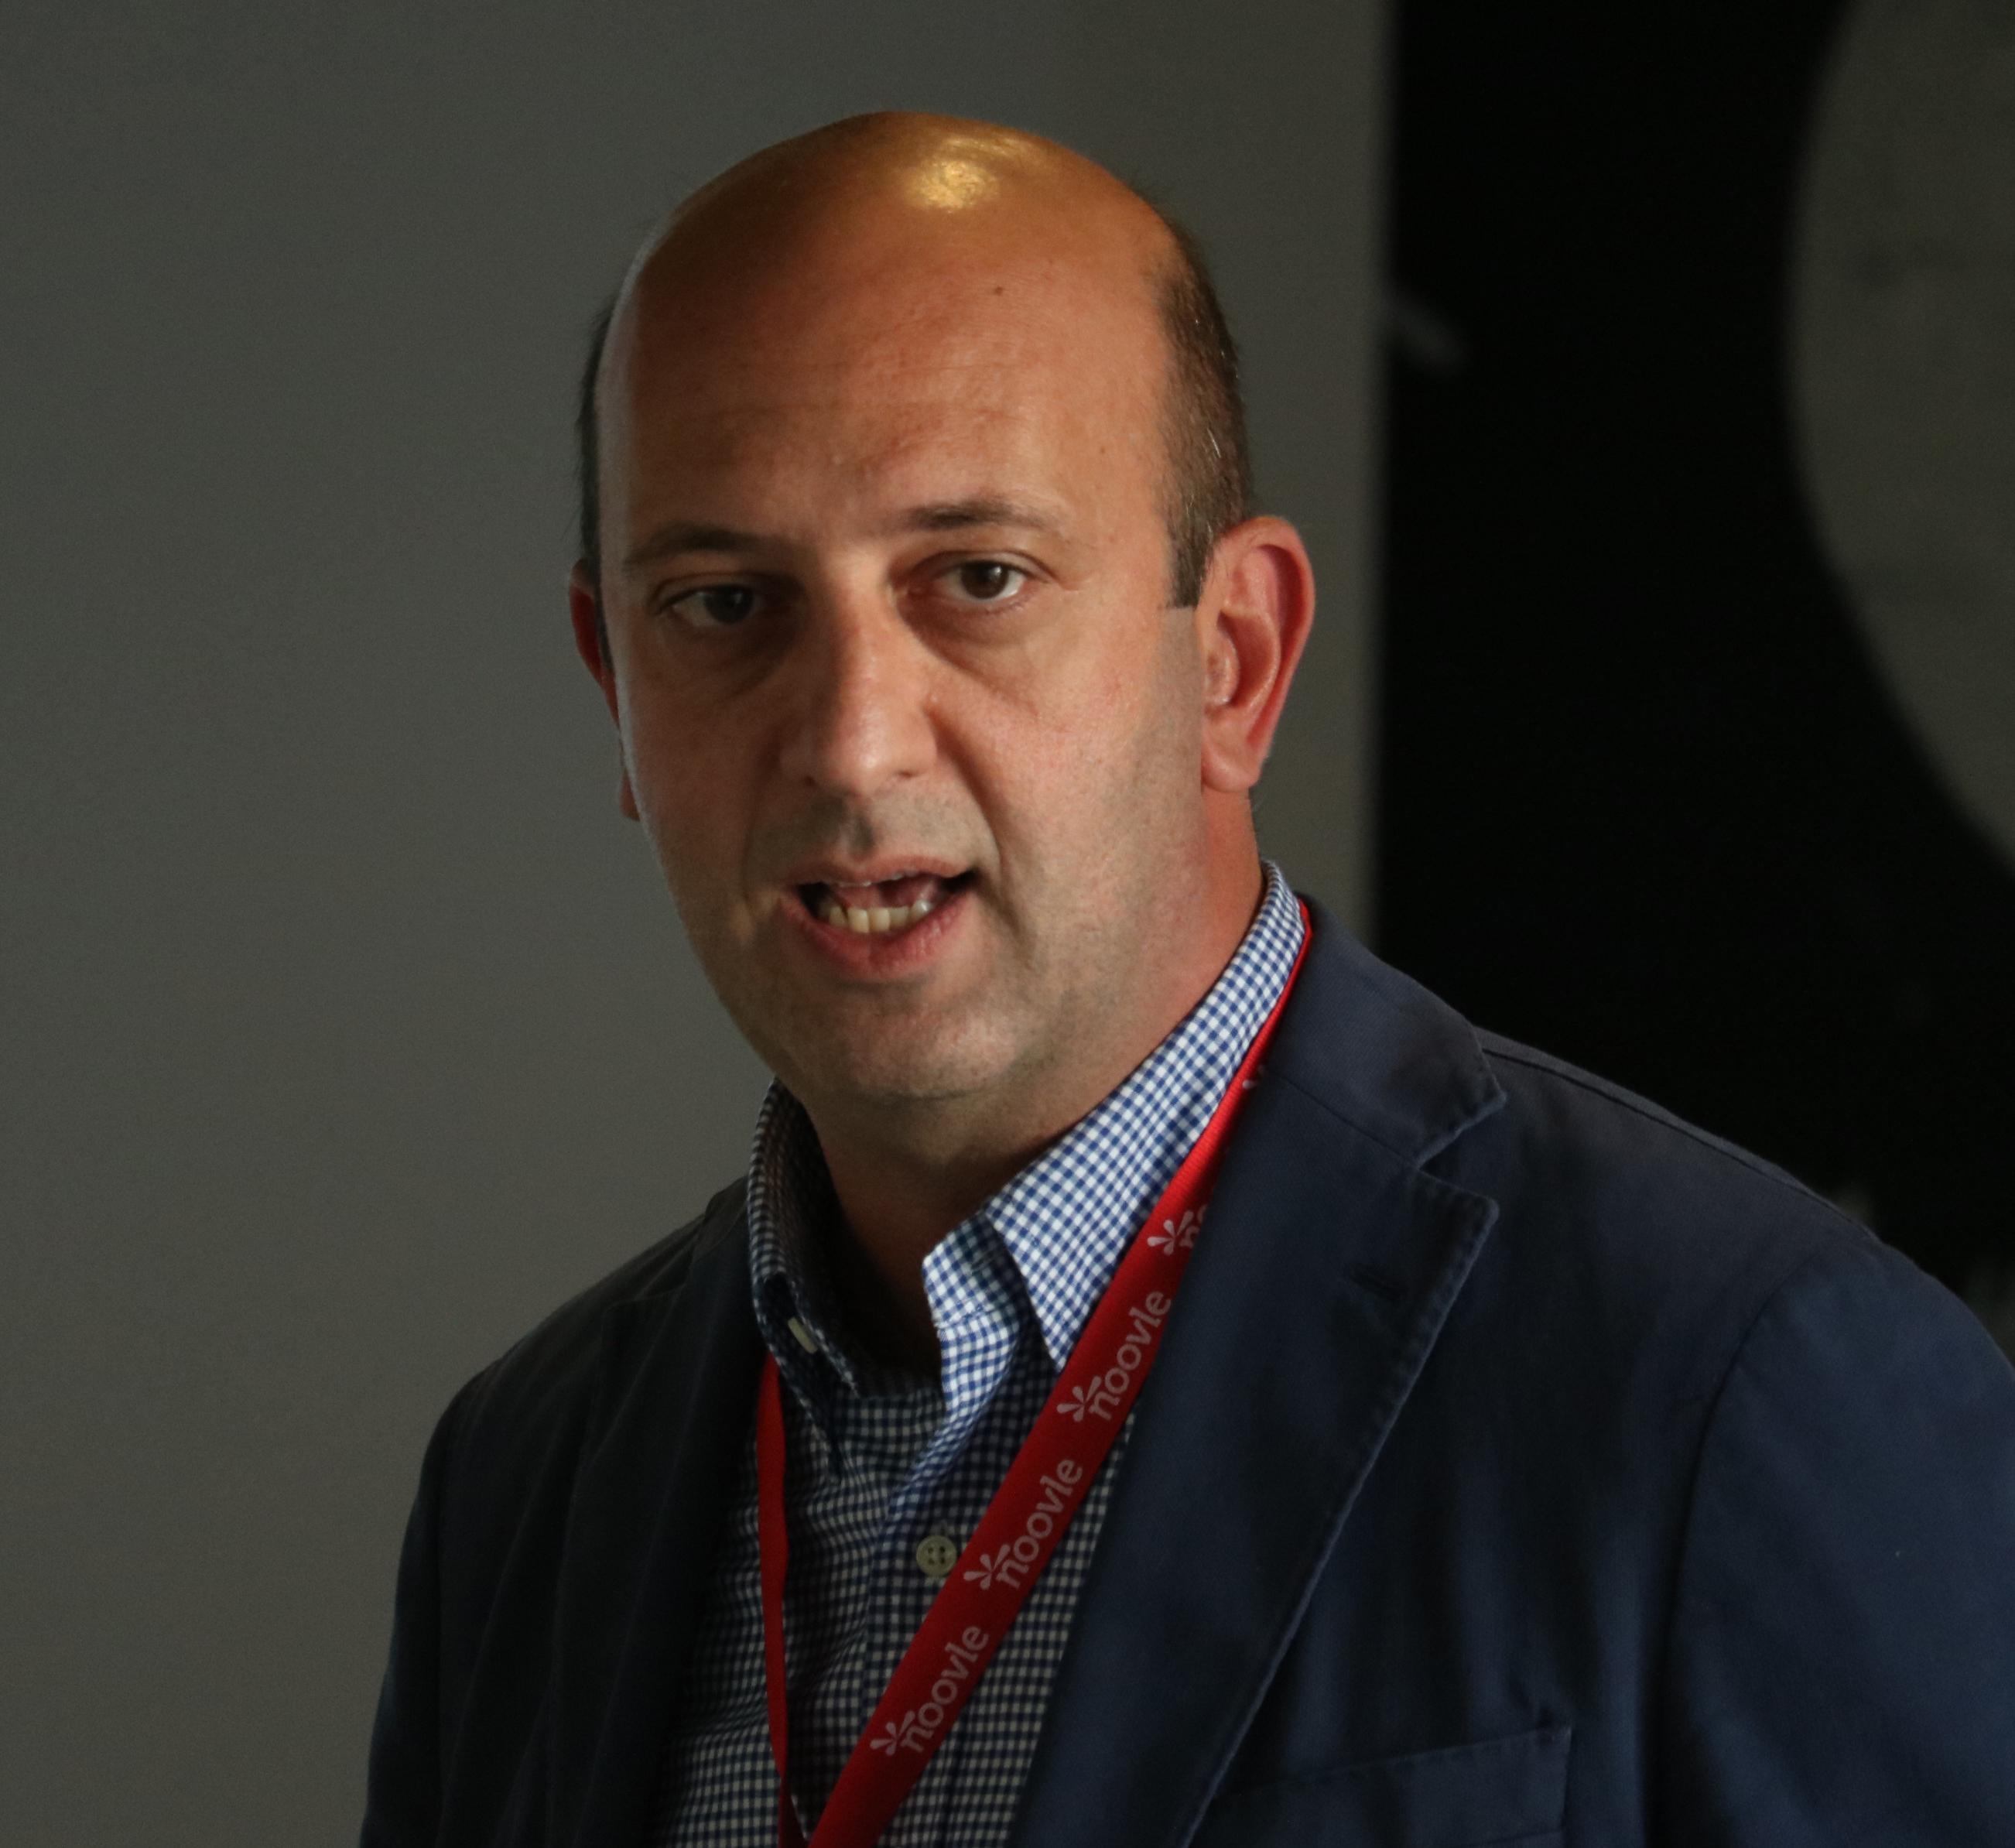 Lorenzo Zannini, Project Director Bper Banca